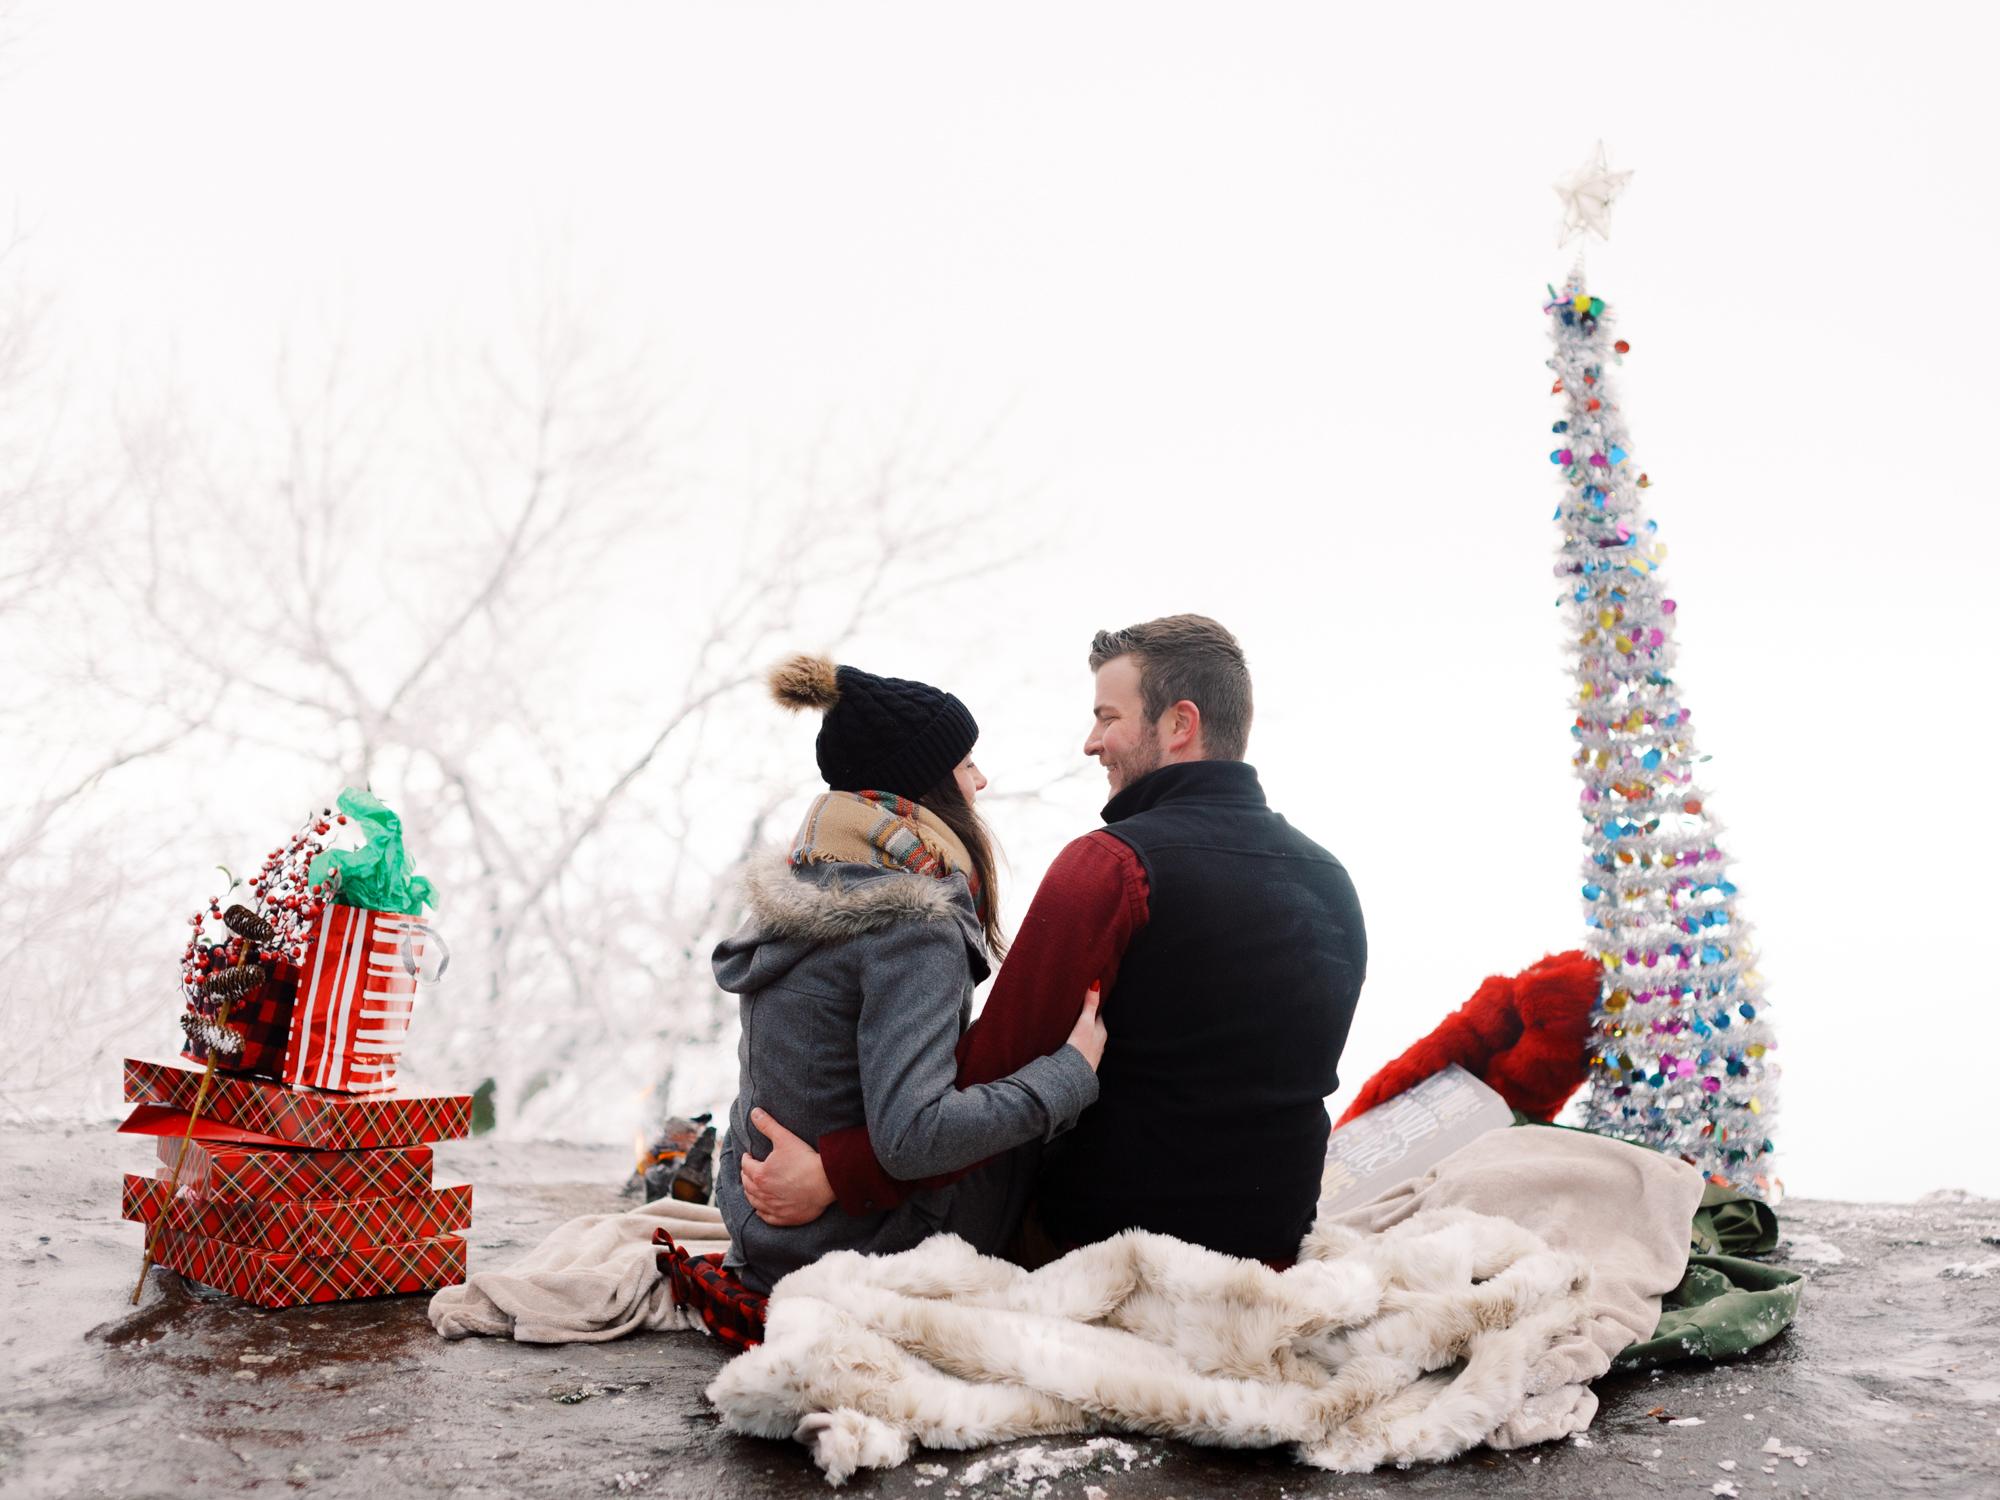 snowy-georgia-proposal-preachers-rock-atlanta-dahlonega-wedding-photographer-hannah-forsberg-fine-art-film-43.jpg